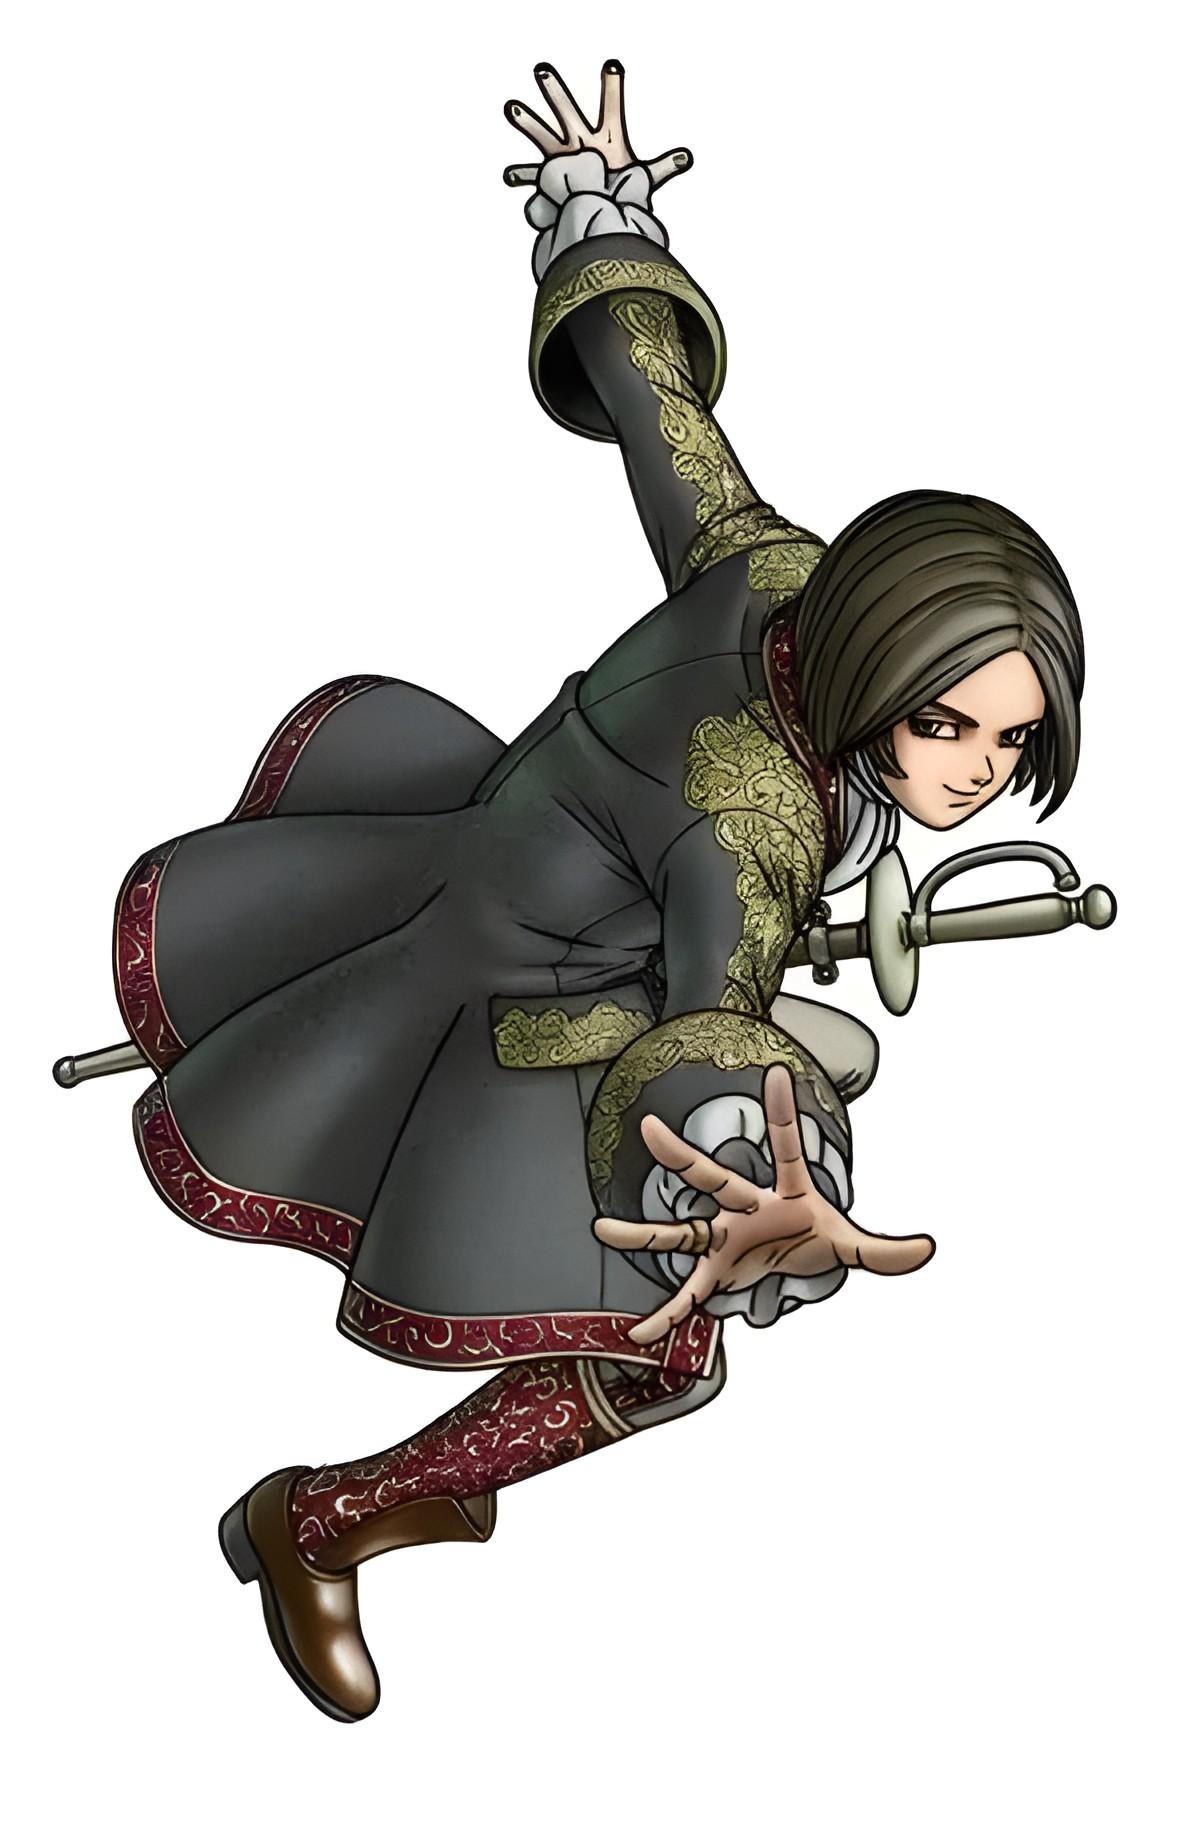 File:Dragon-quest-swords-Anlace.jpg